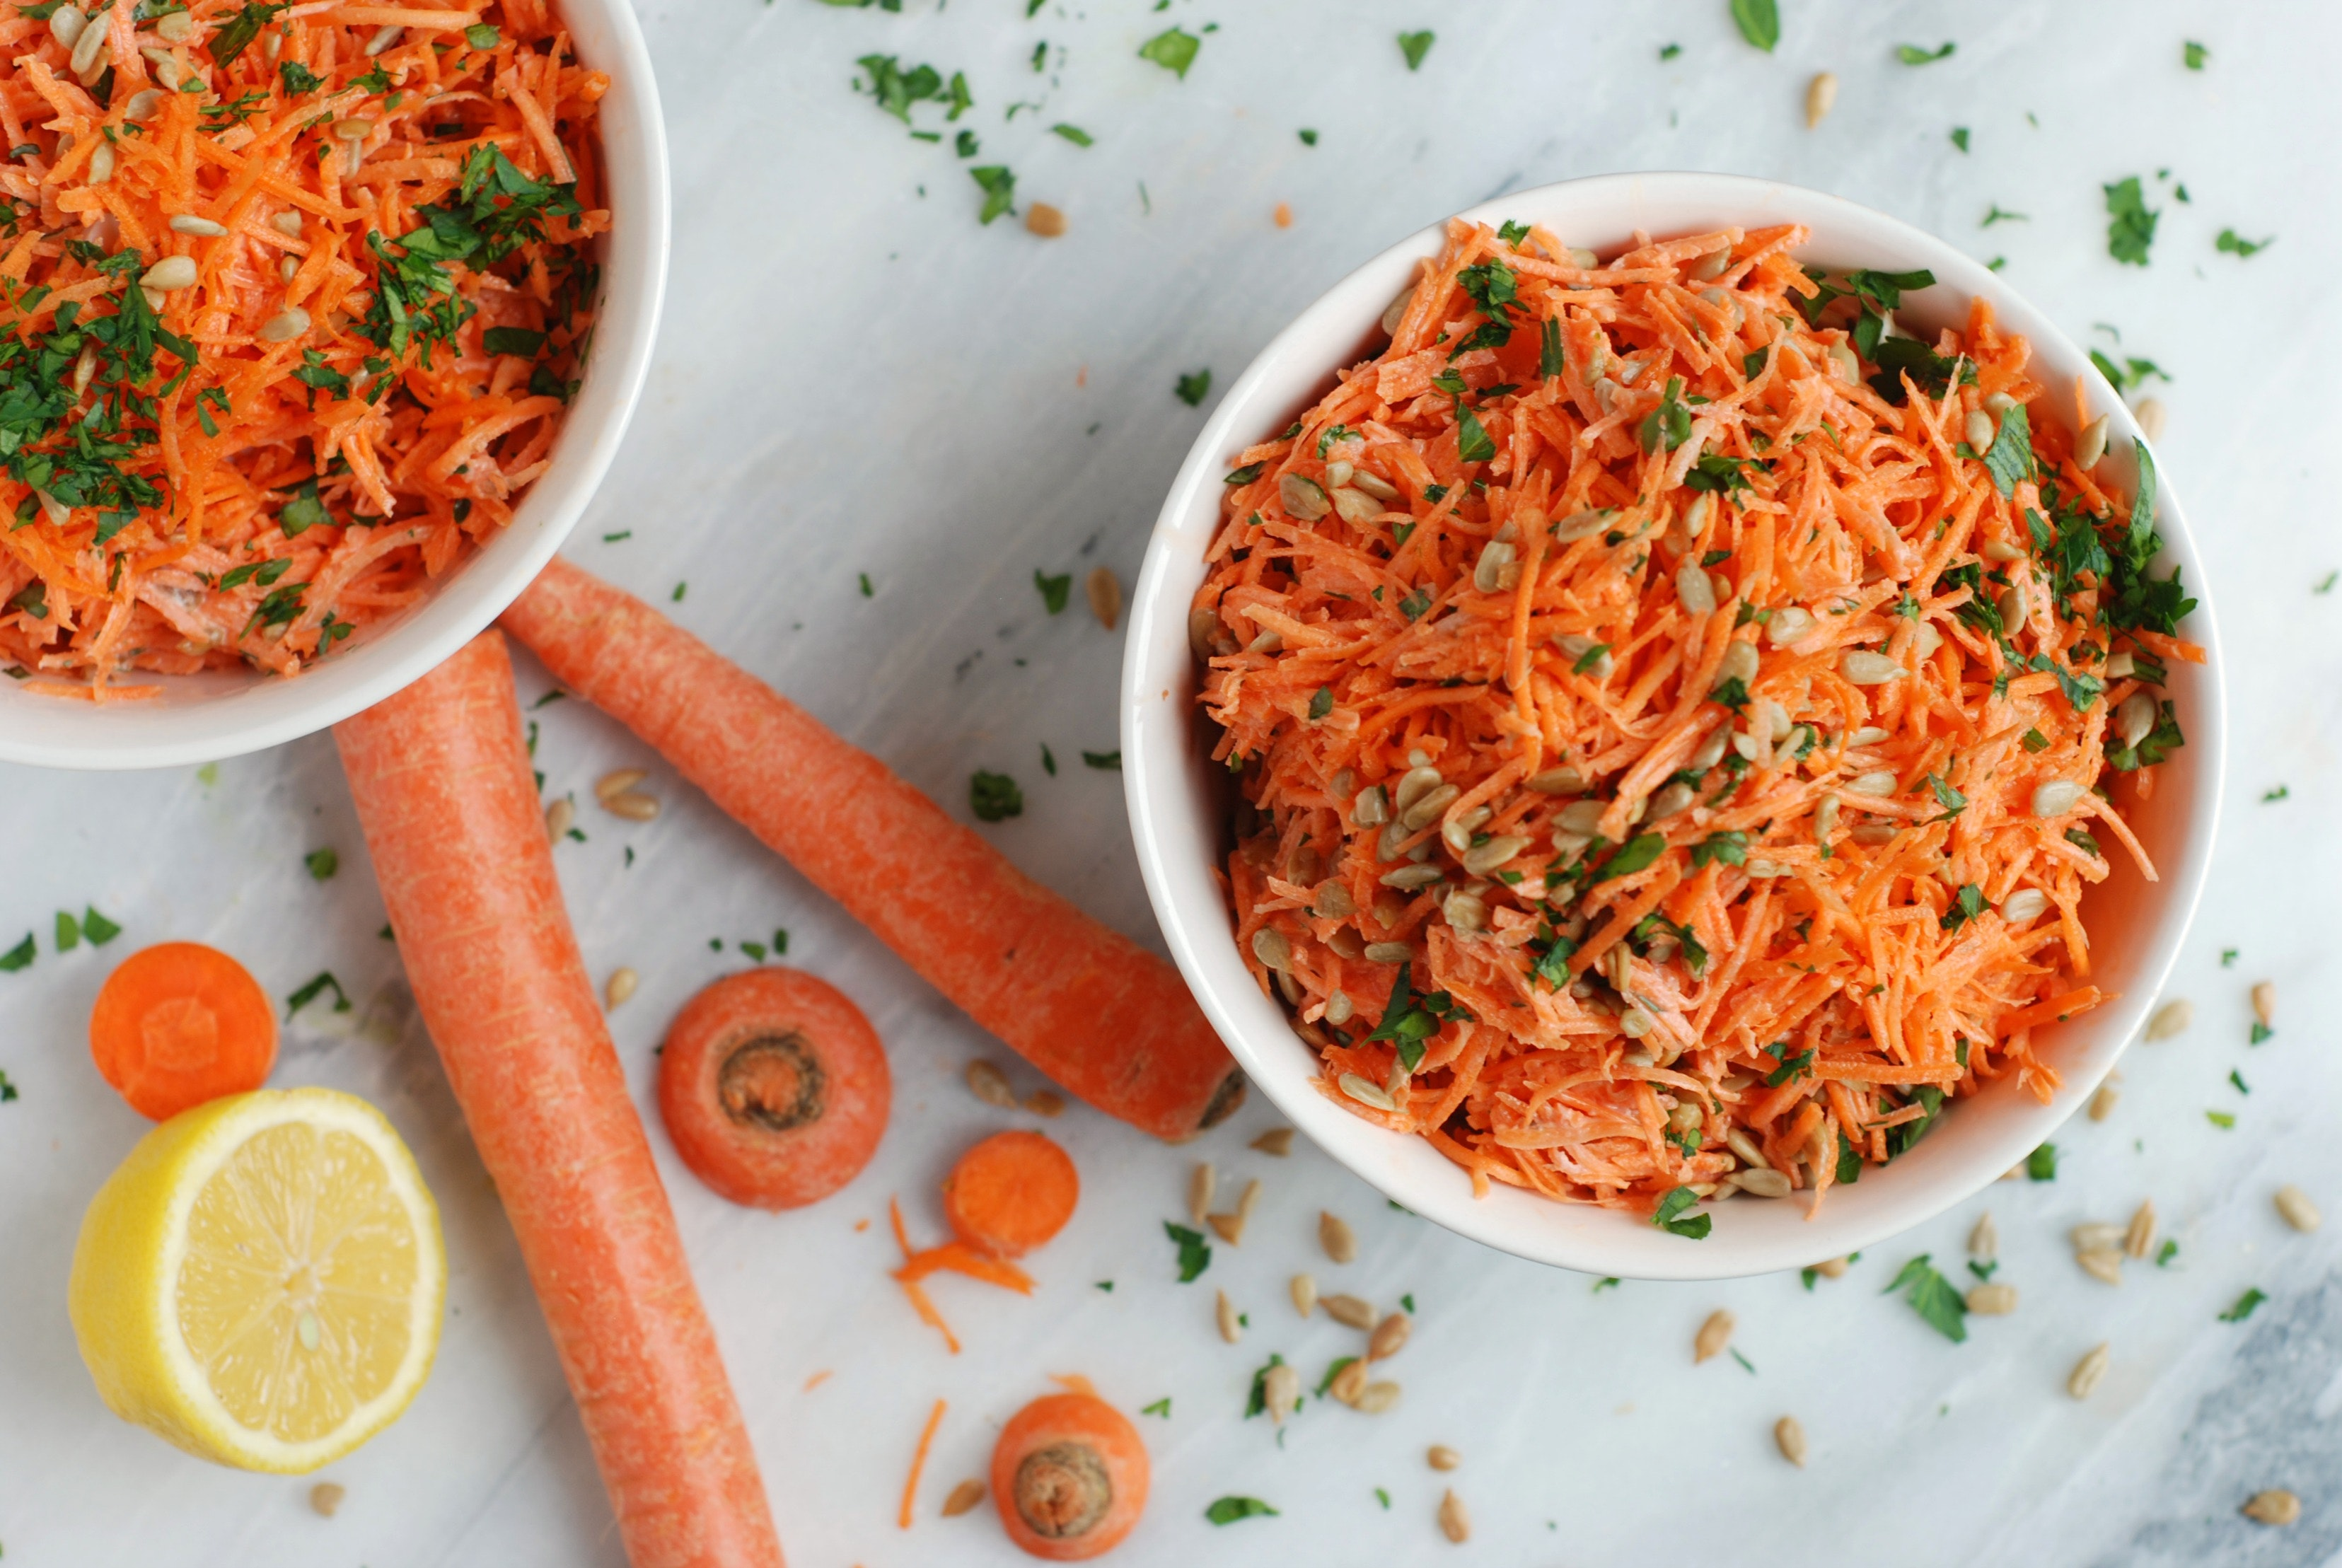 Simple Carrot Salad with Lemon Vinaigrette